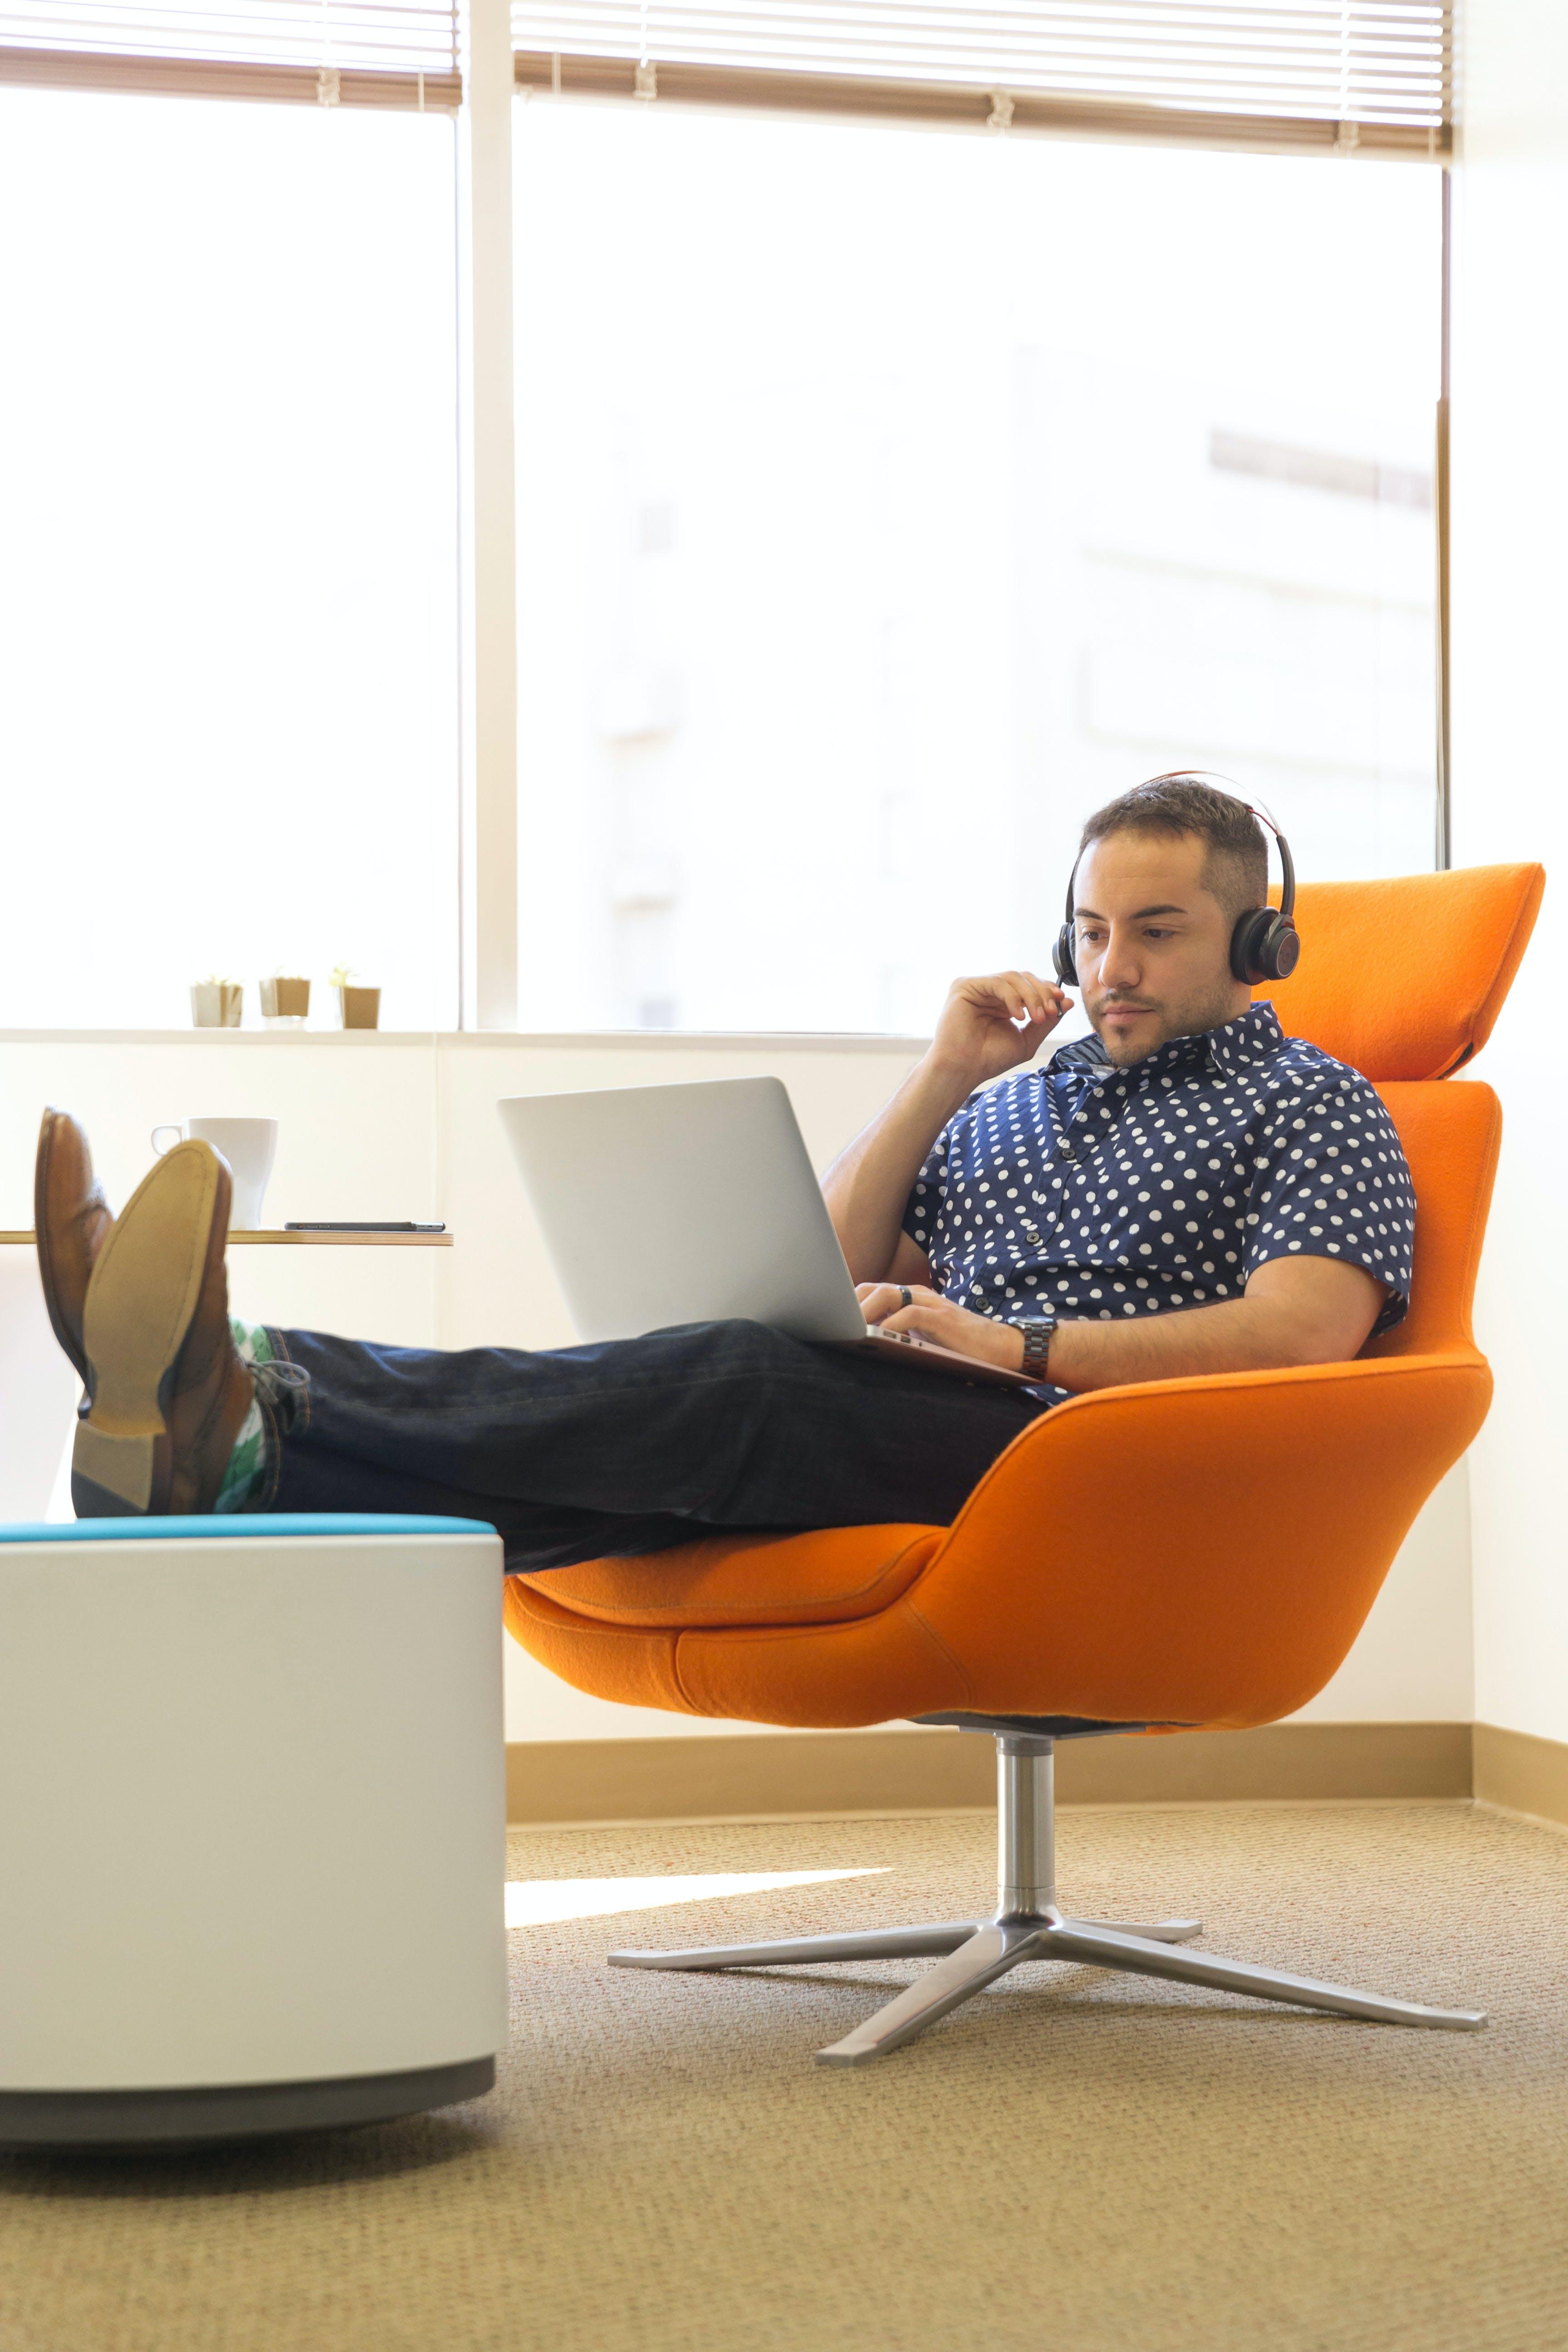 Man Wearing Headphones Sitting on Orange Padded Chair While Using Laptop Computer